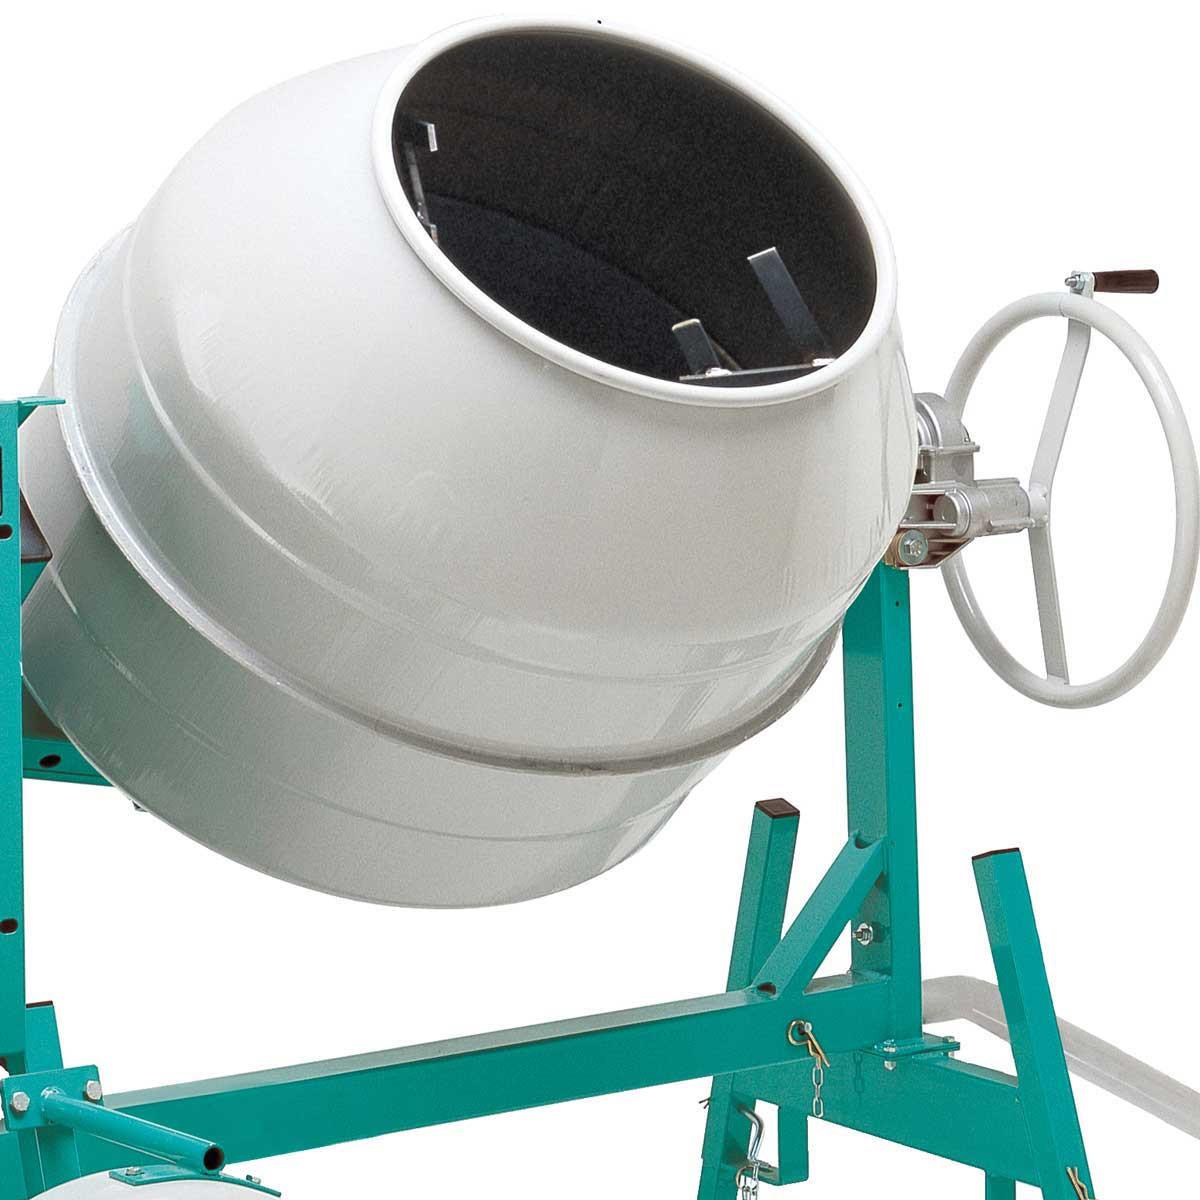 Imer Workman Concrete Mixer drum